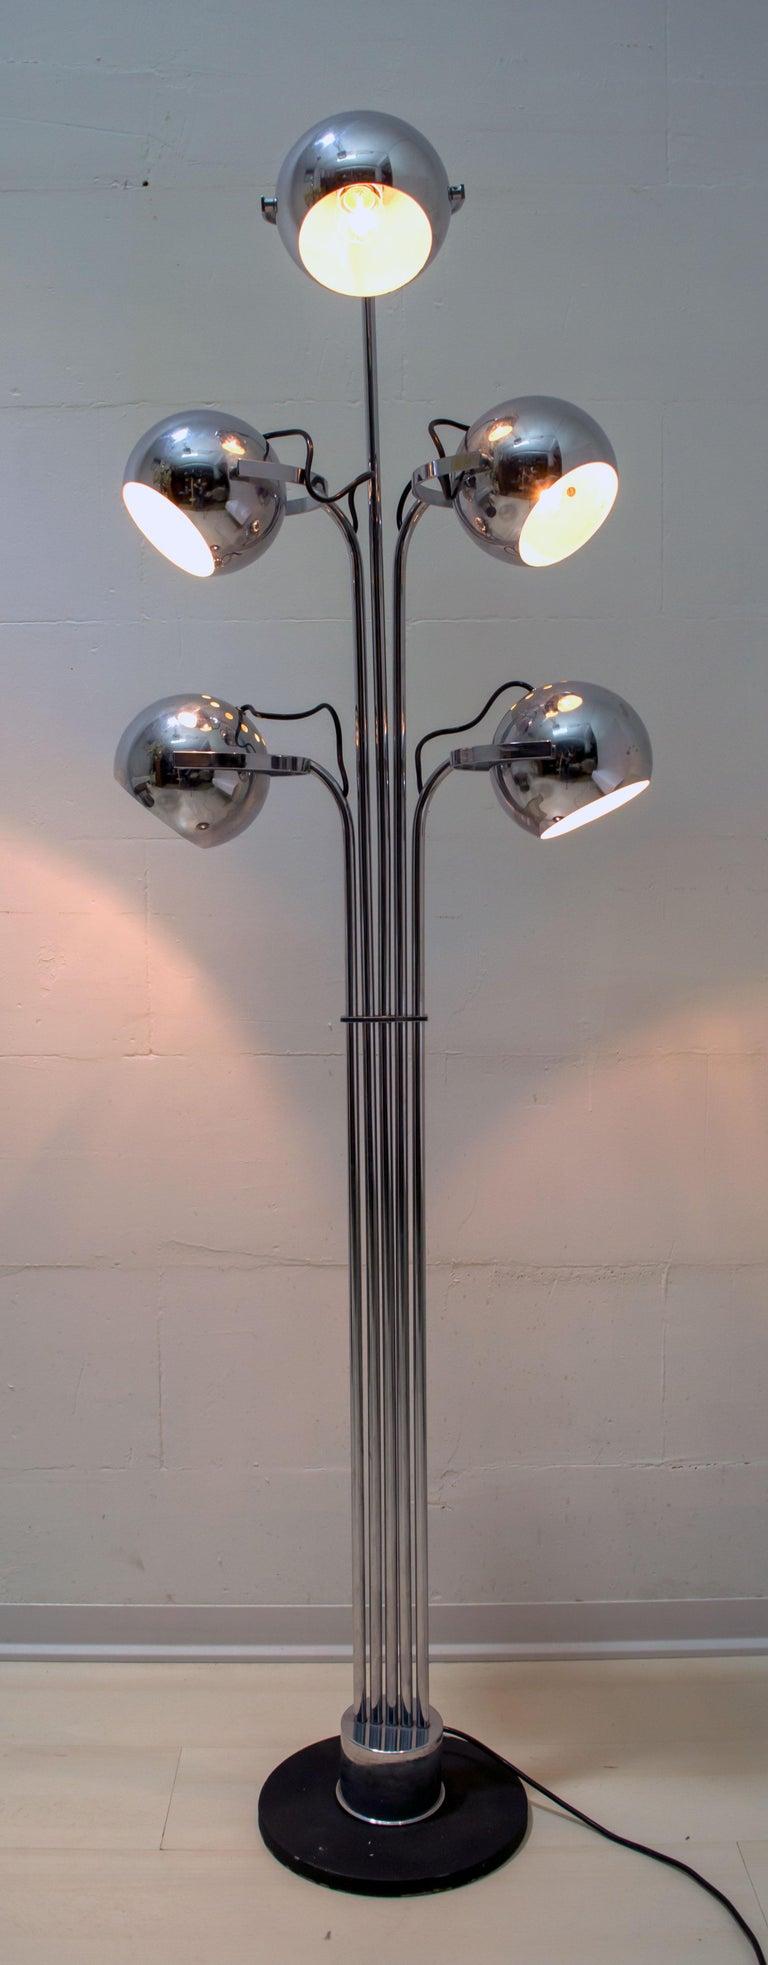 Metal Goffredo Reggiani Mid-Century Modern Italian 5 Lights Chrome Floor Lamp, 1970s For Sale